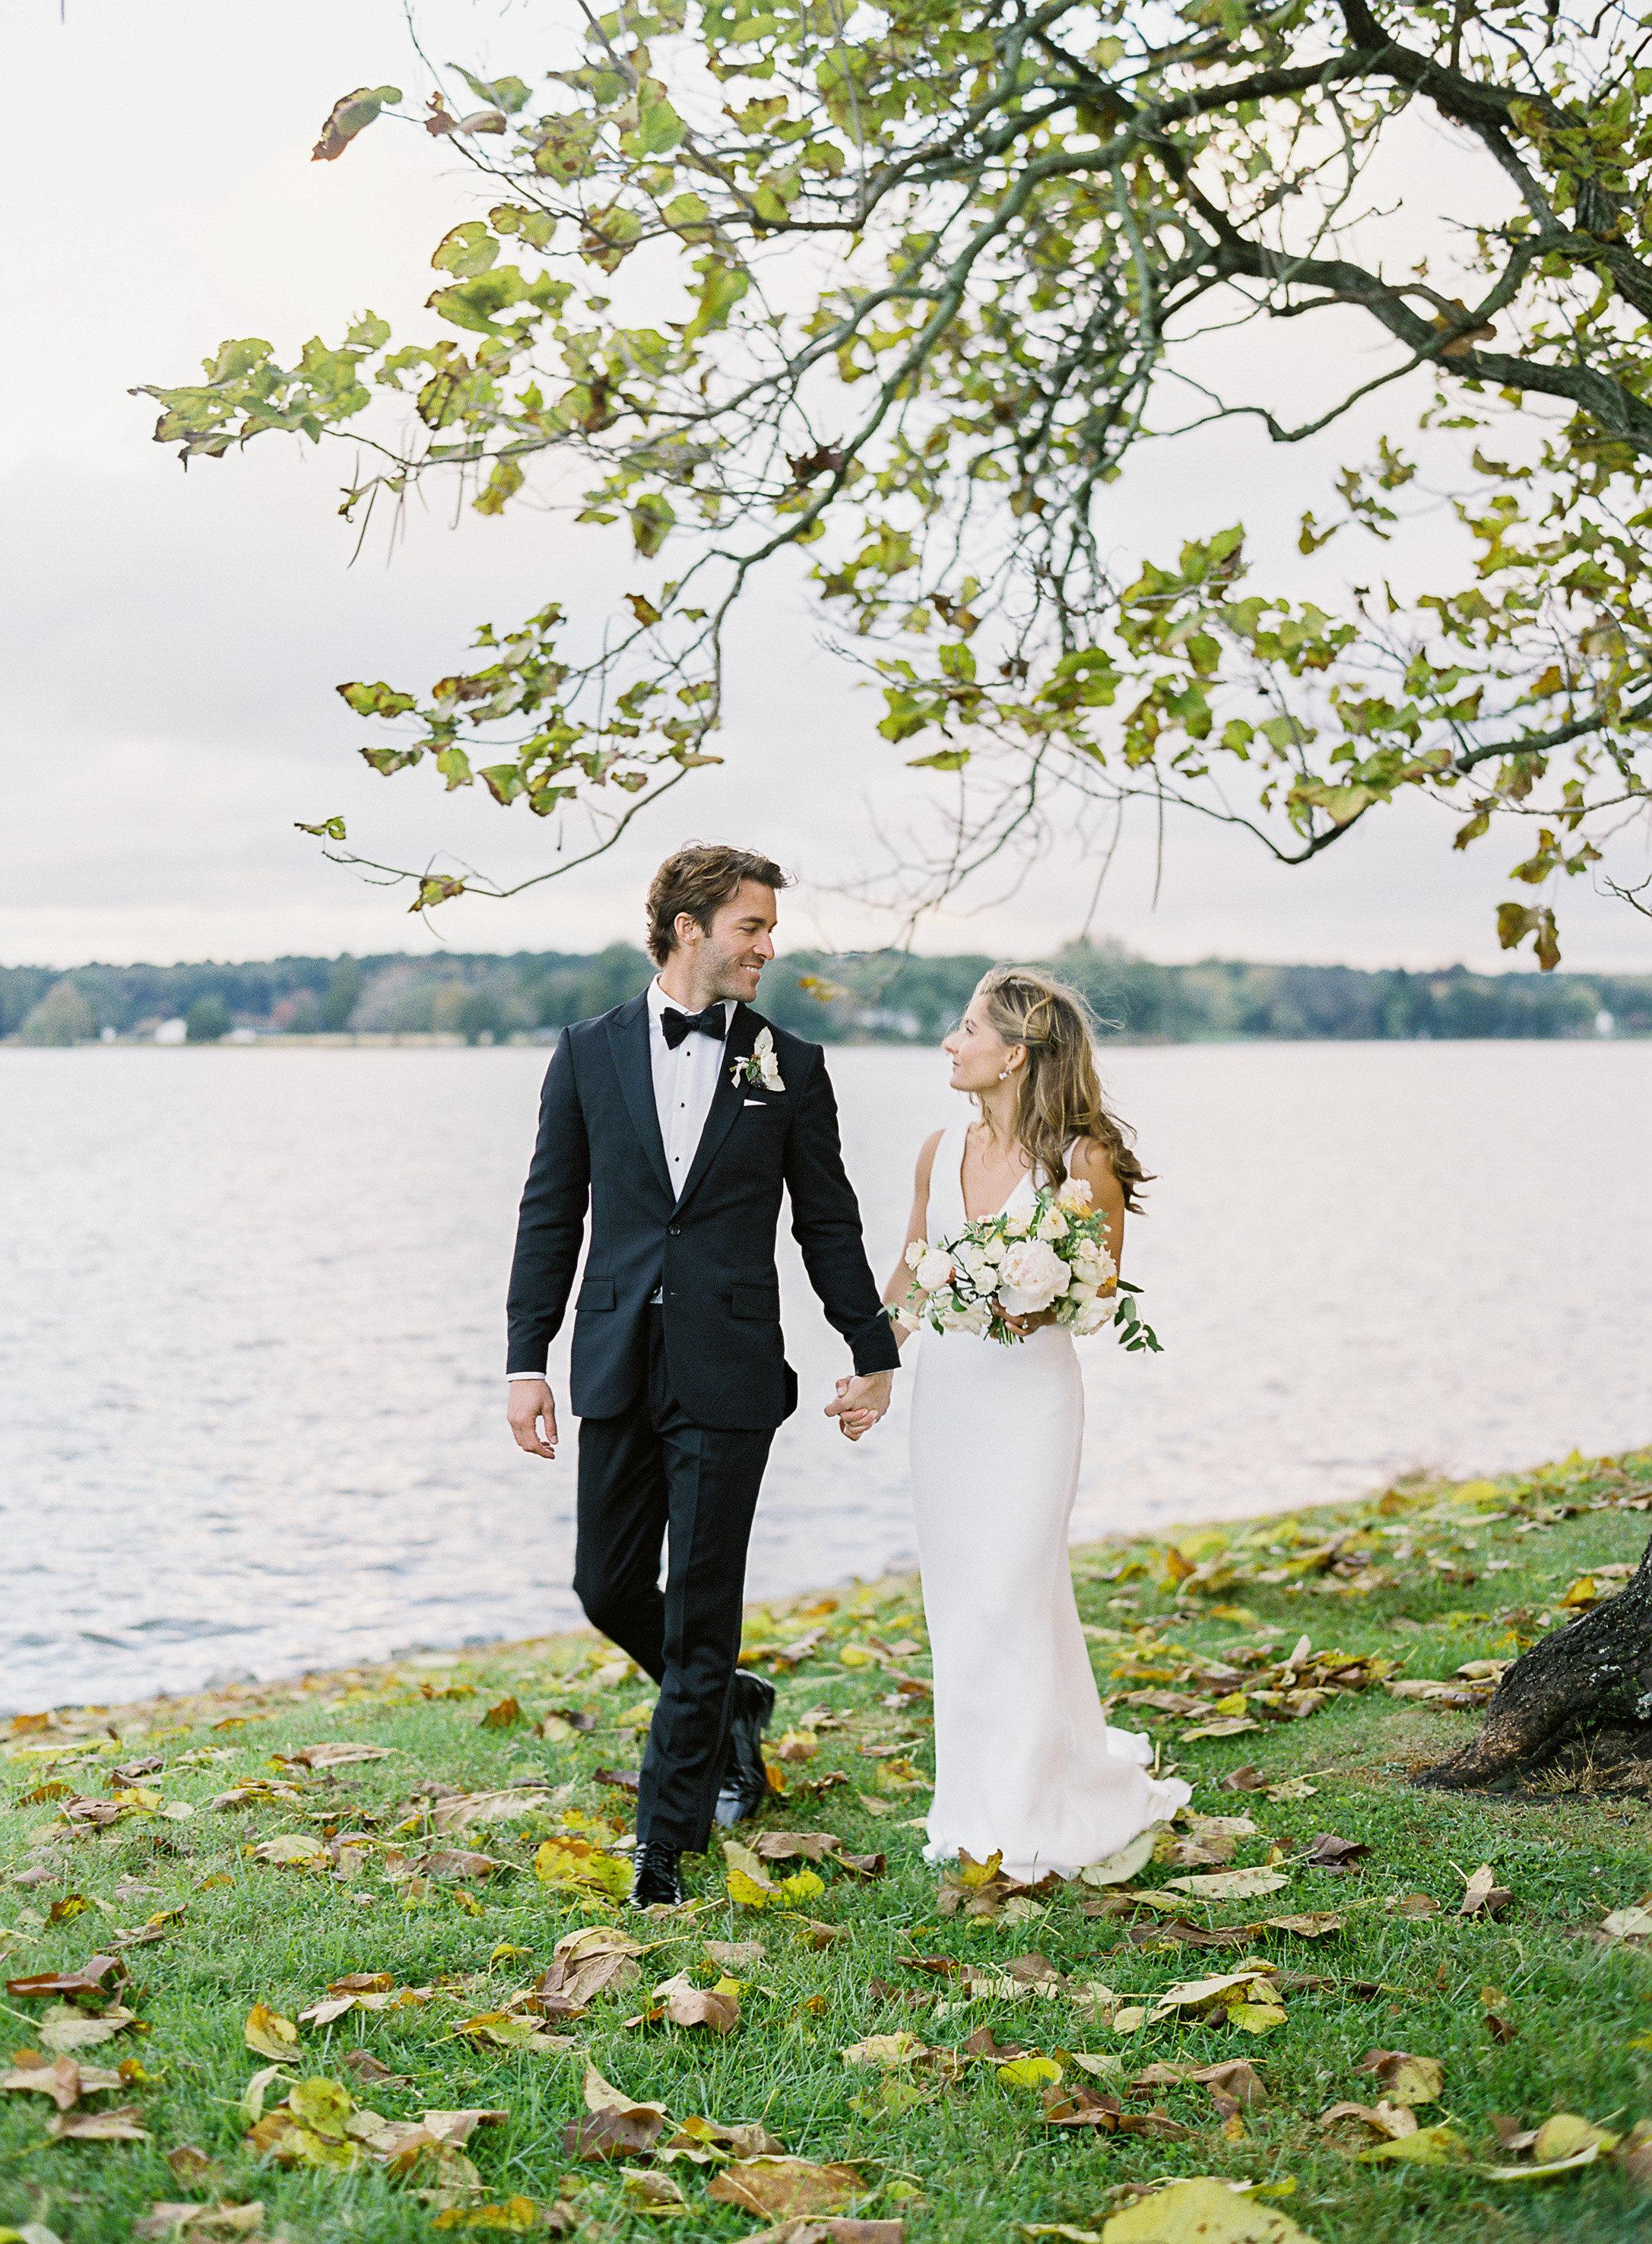 lauren alex wedding couple walking by water